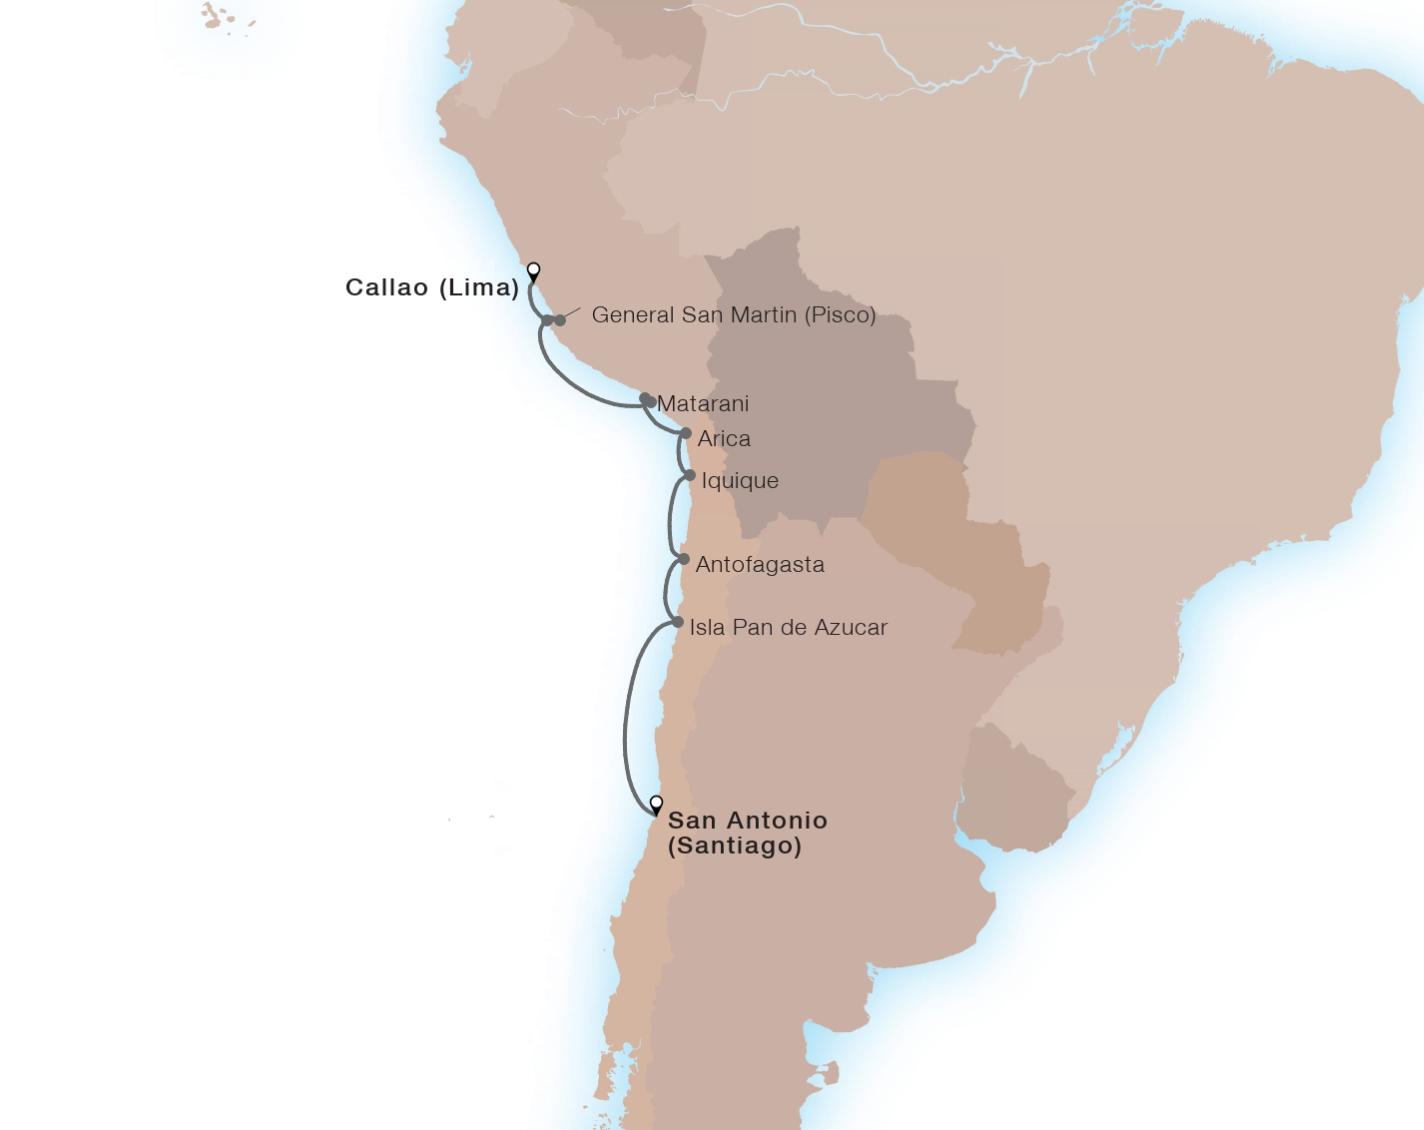 9-Day Treasures Of The Inca Coast - SEABOURN QUESTCallao (Lima), Peru to San Antonio (Santiago), Chile